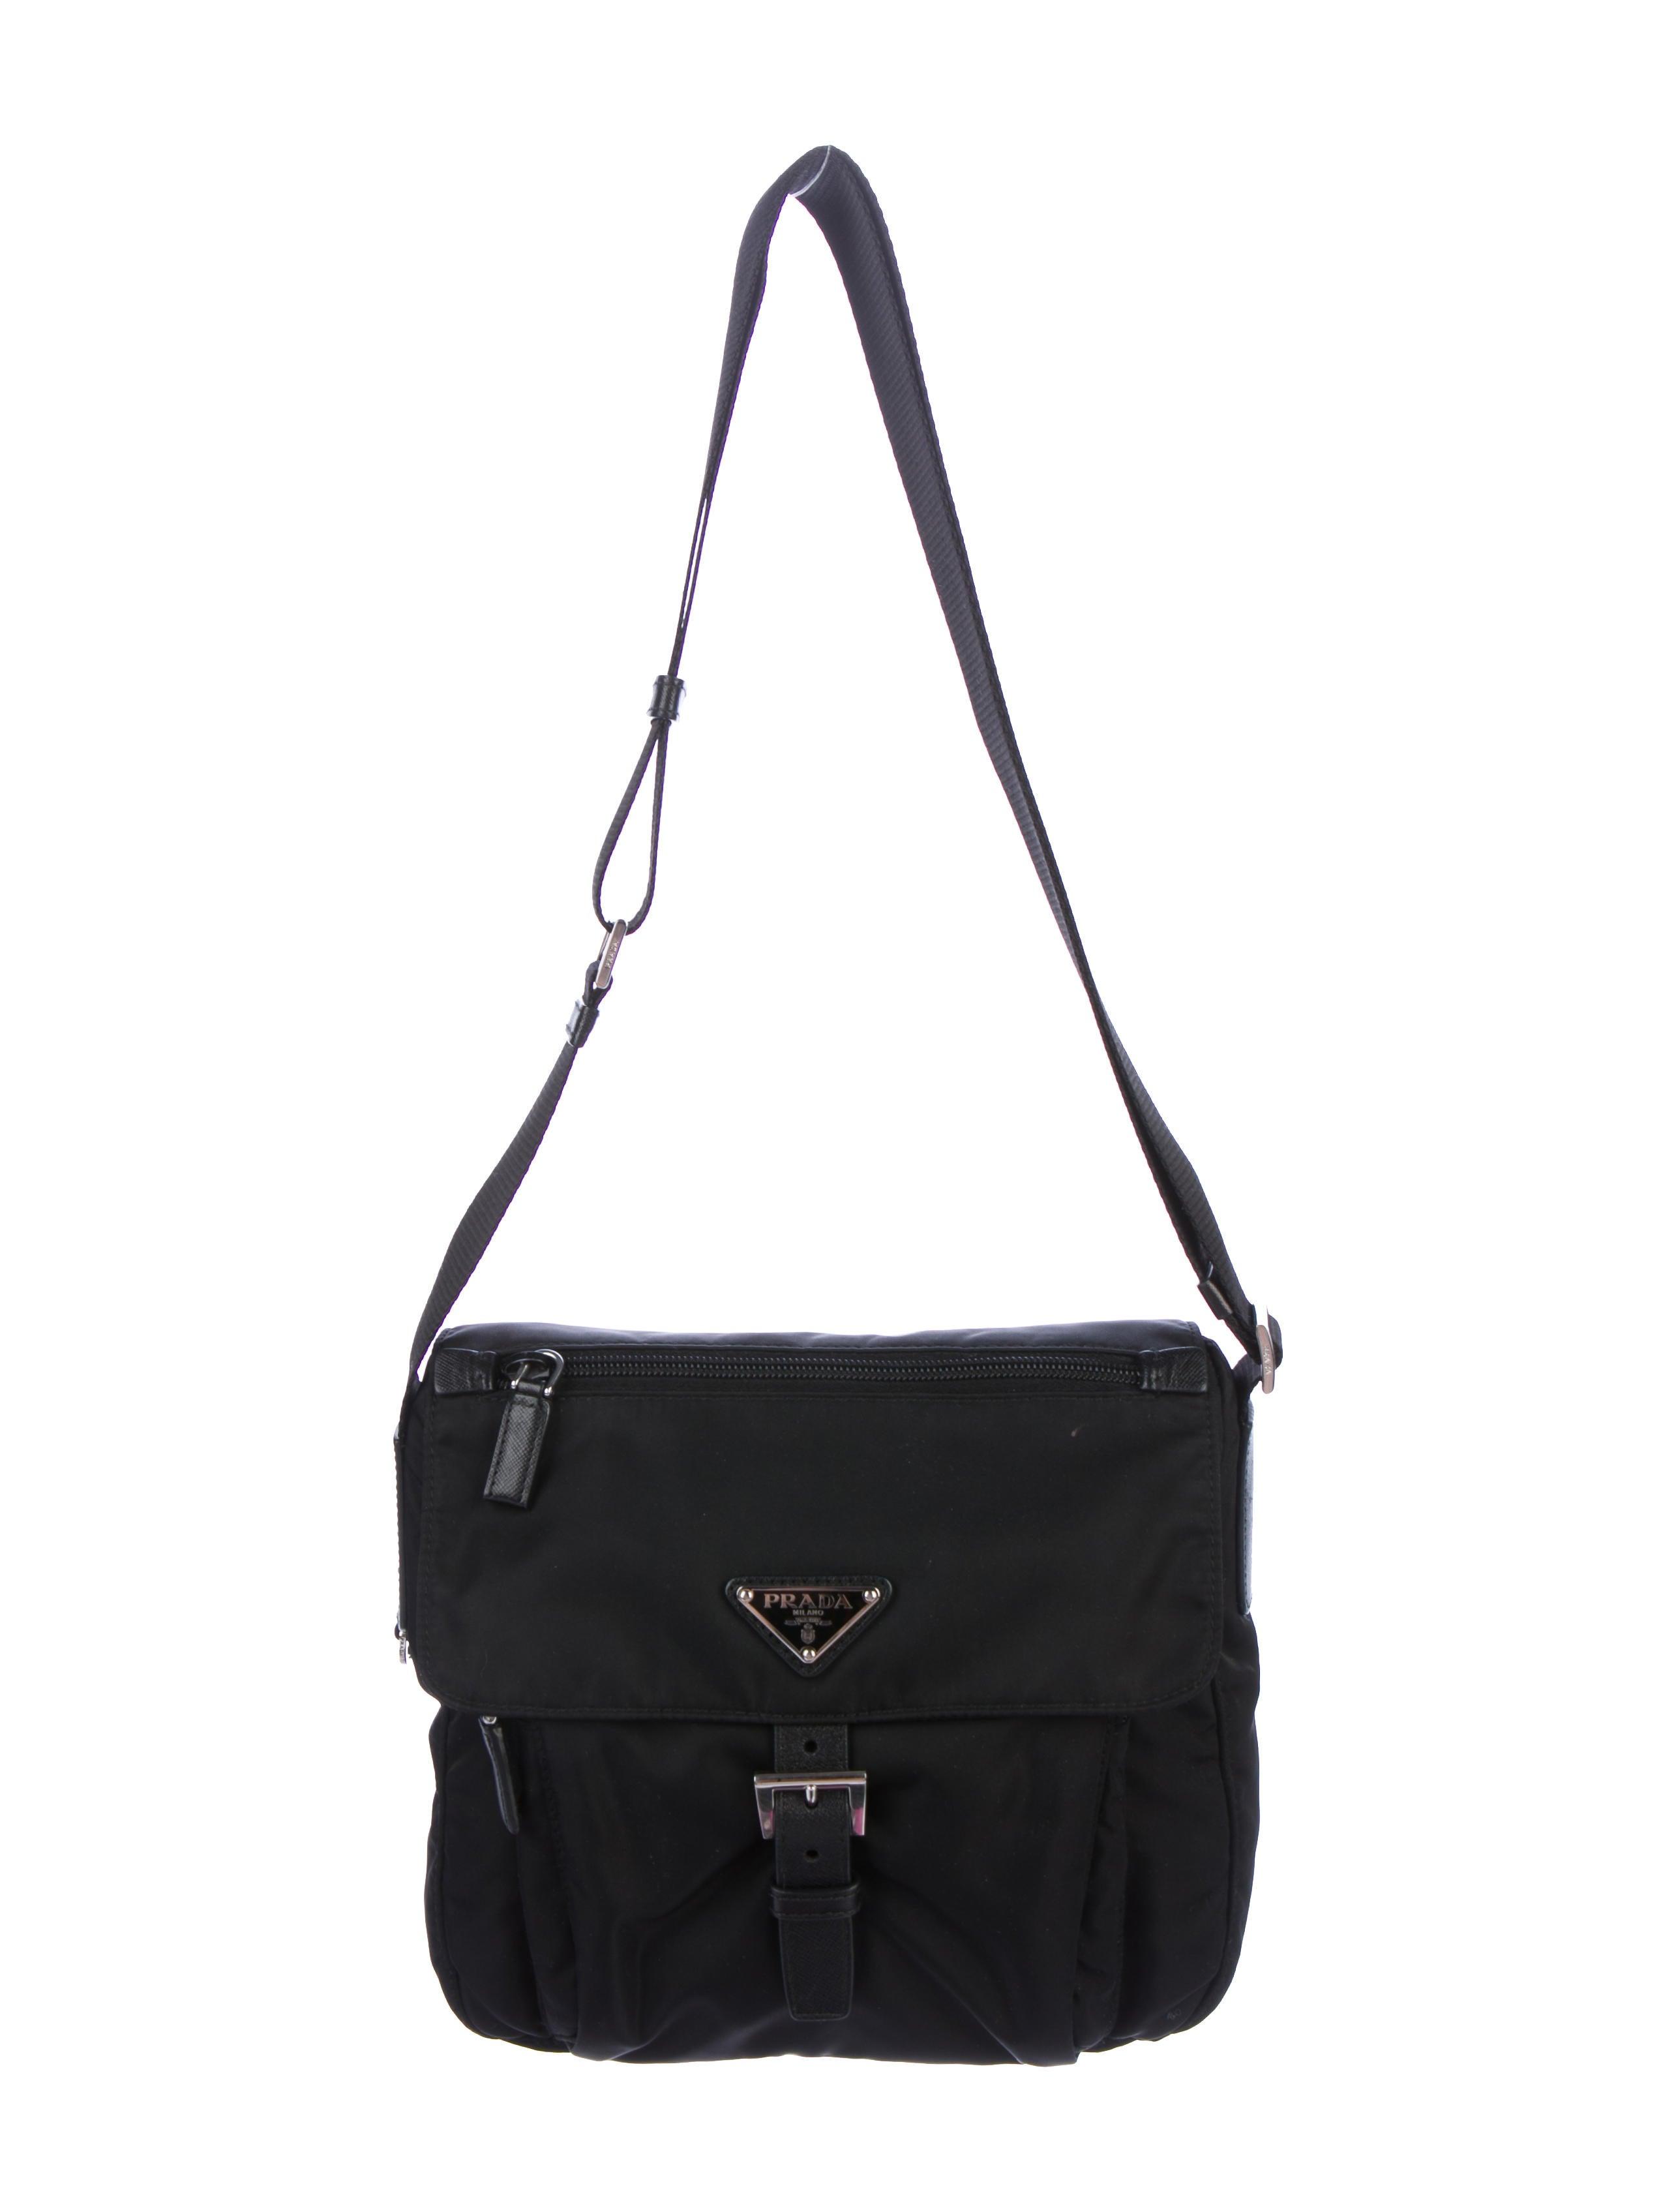 be18c6de0b08 discount code for prada vela flat crossbody bag black f552c 72c3b; italy  prada tessuto messenger bag handbags pra203984 the realreal 0fa03 893b3